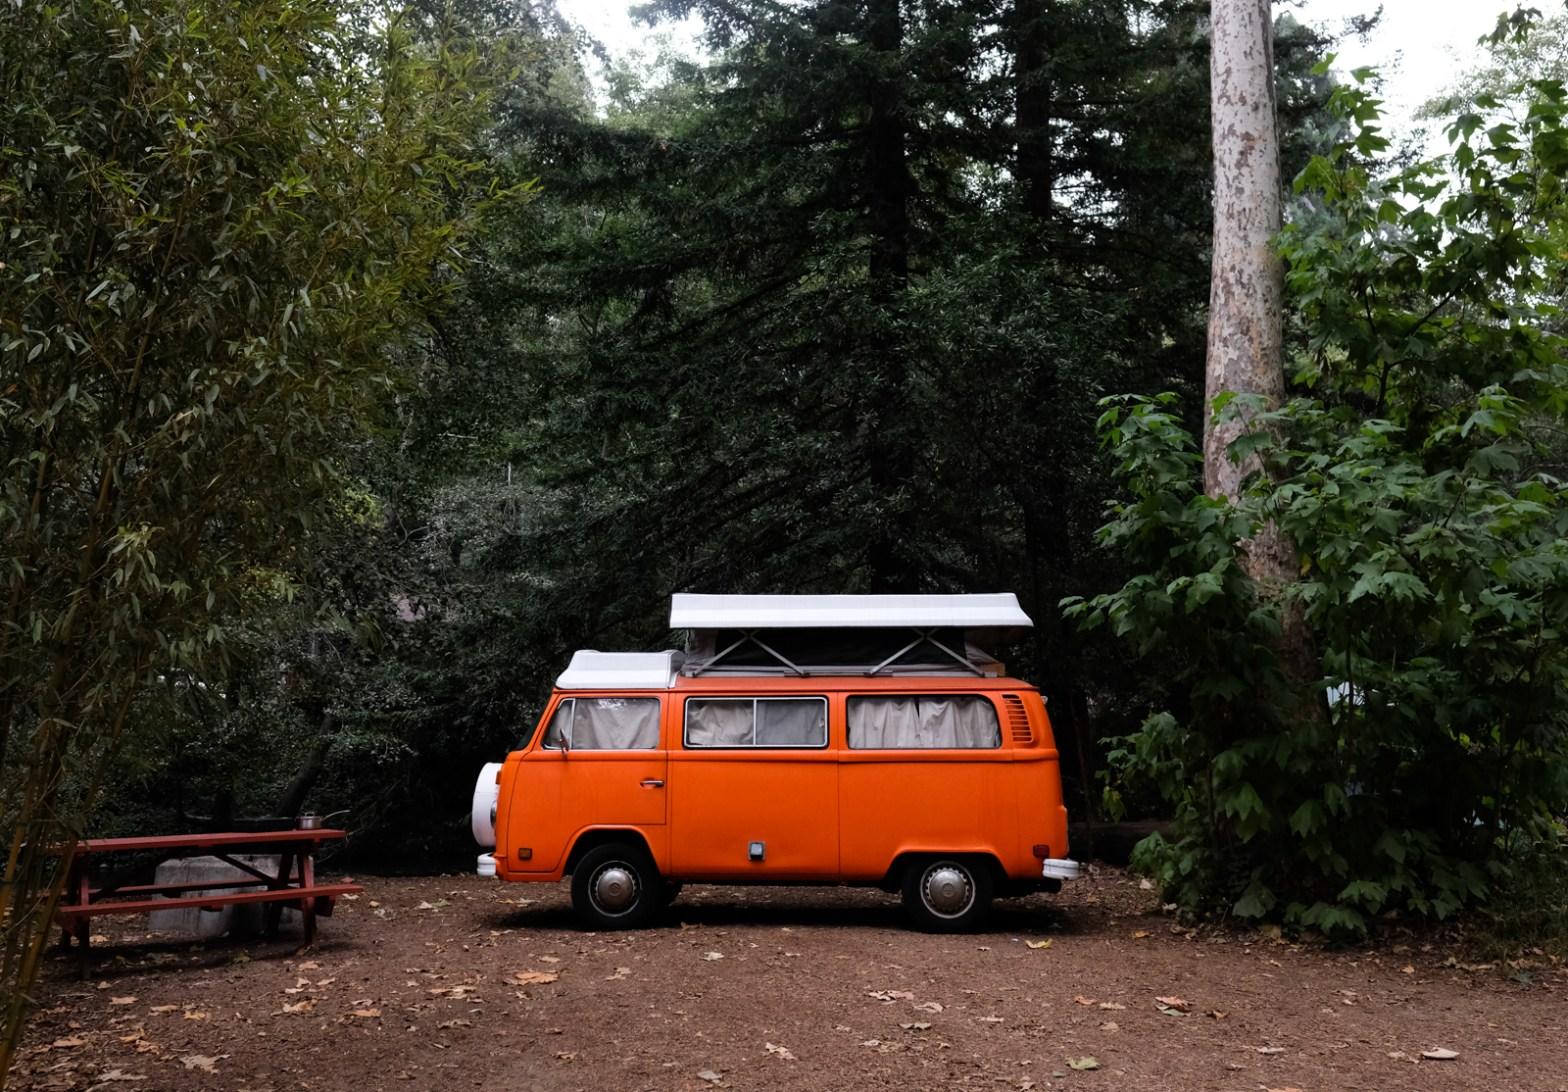 an orange VW camper van